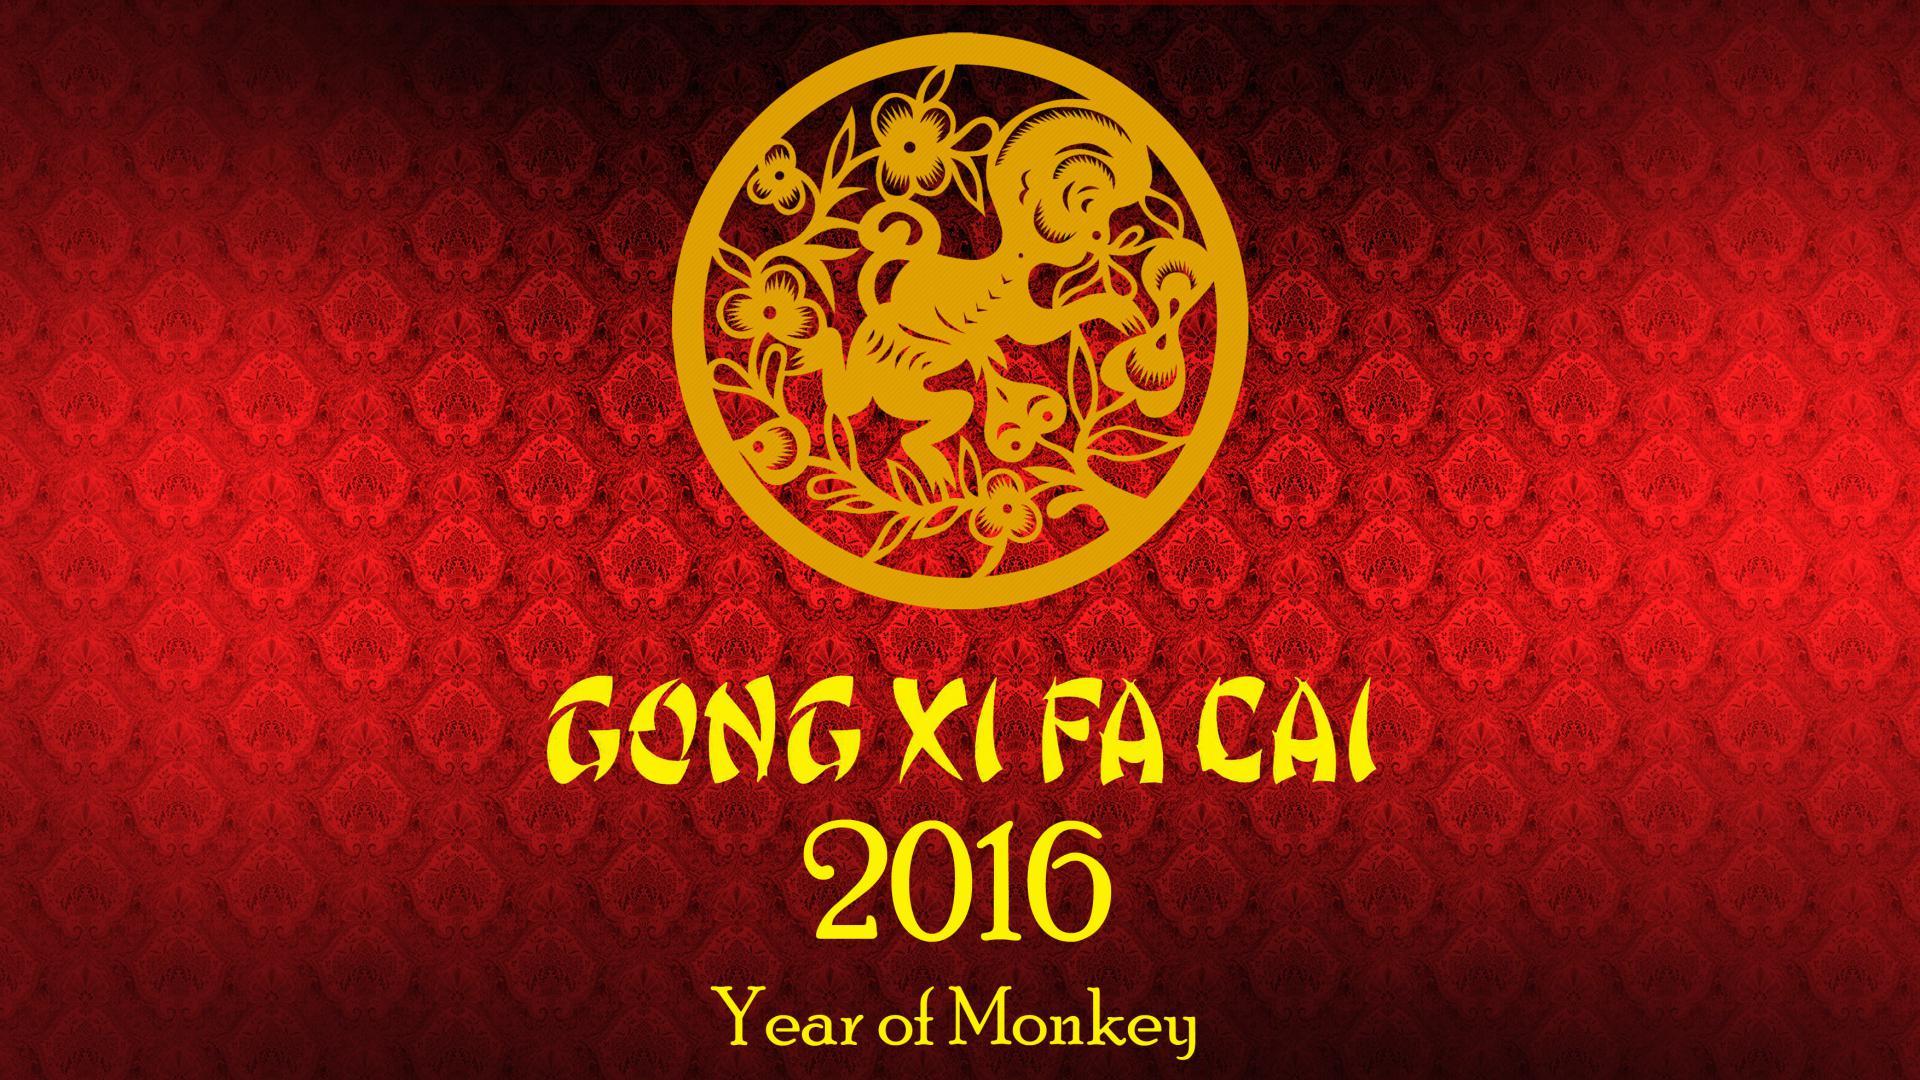 45] Chinese New Year 2016 Wallpaper on WallpaperSafari 1920x1080